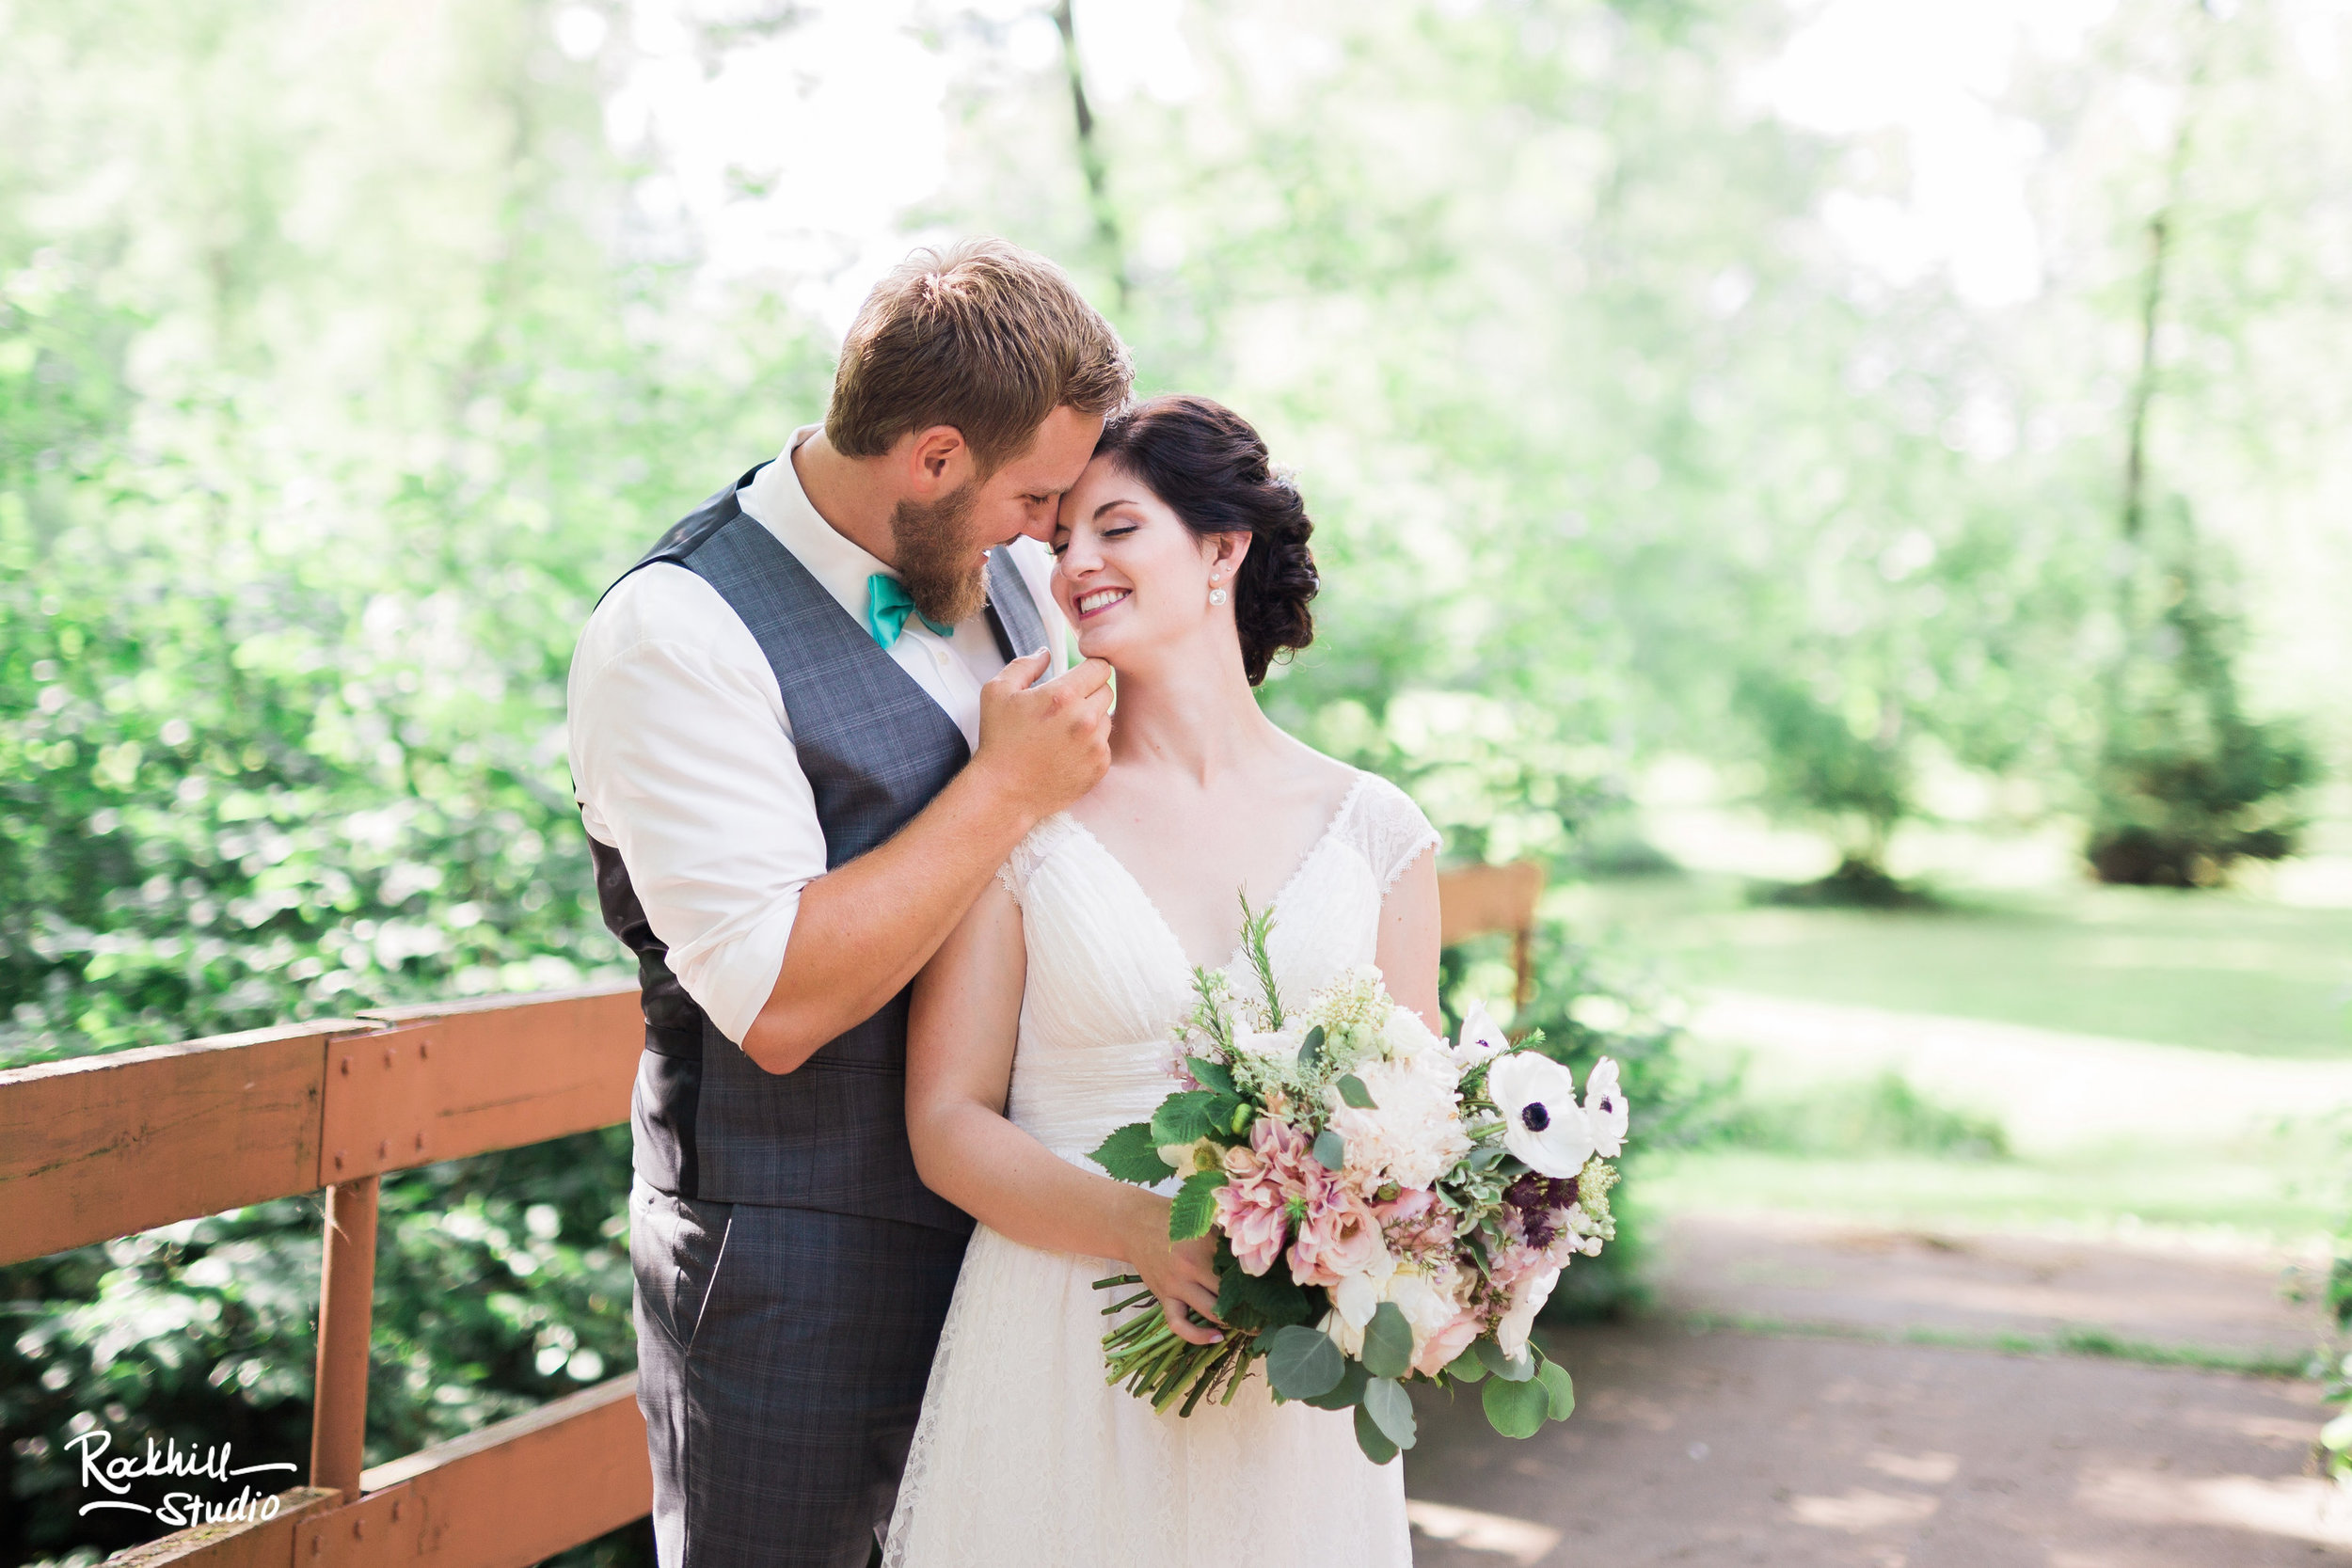 traverse_city_wedding_photographer_rockhill_studio_destination_petoskey_1a.jpg